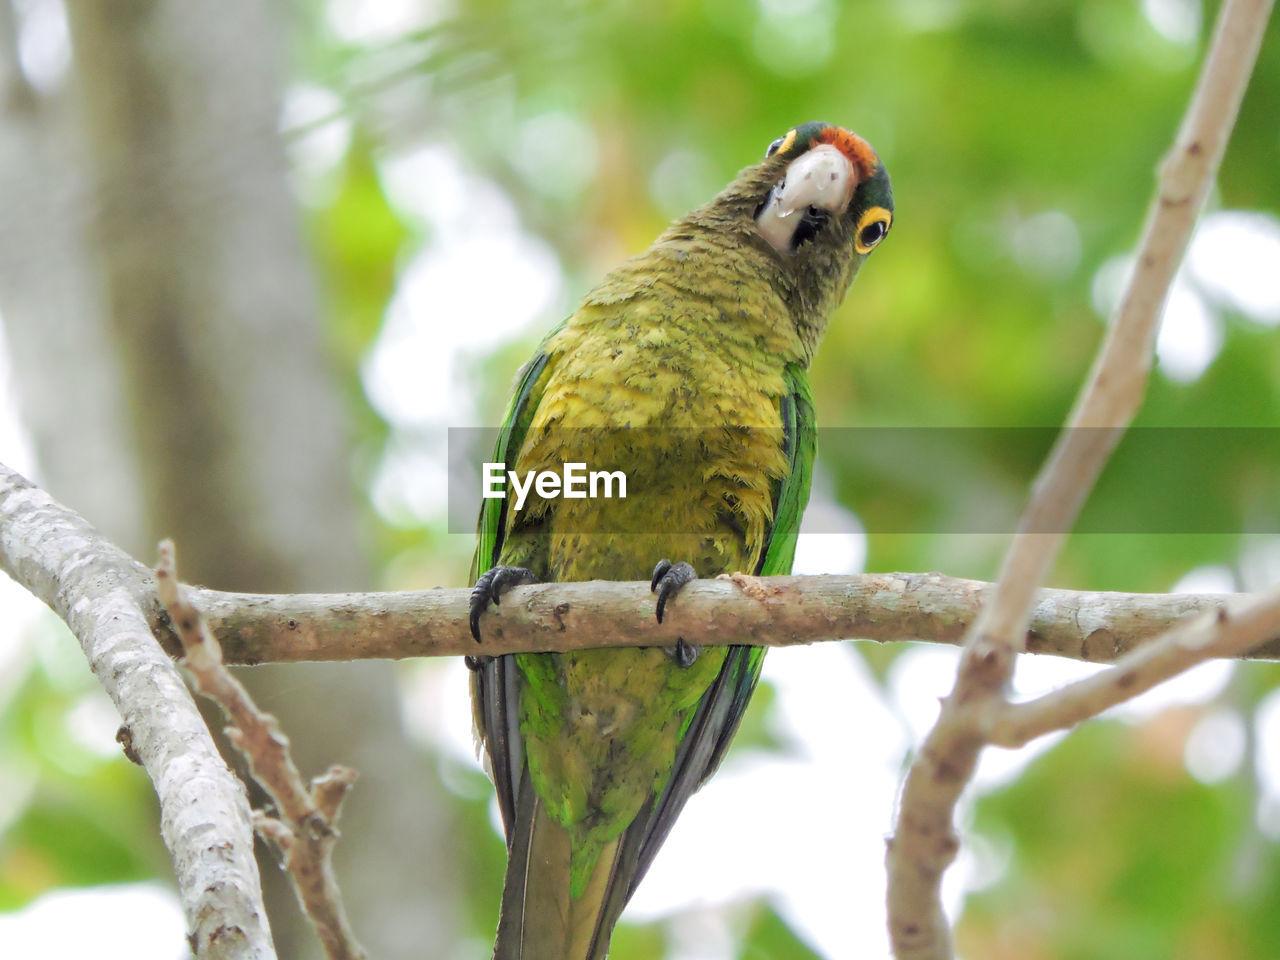 CLOSE-UP OF BIRD PERCHING ON TREE BRANCH